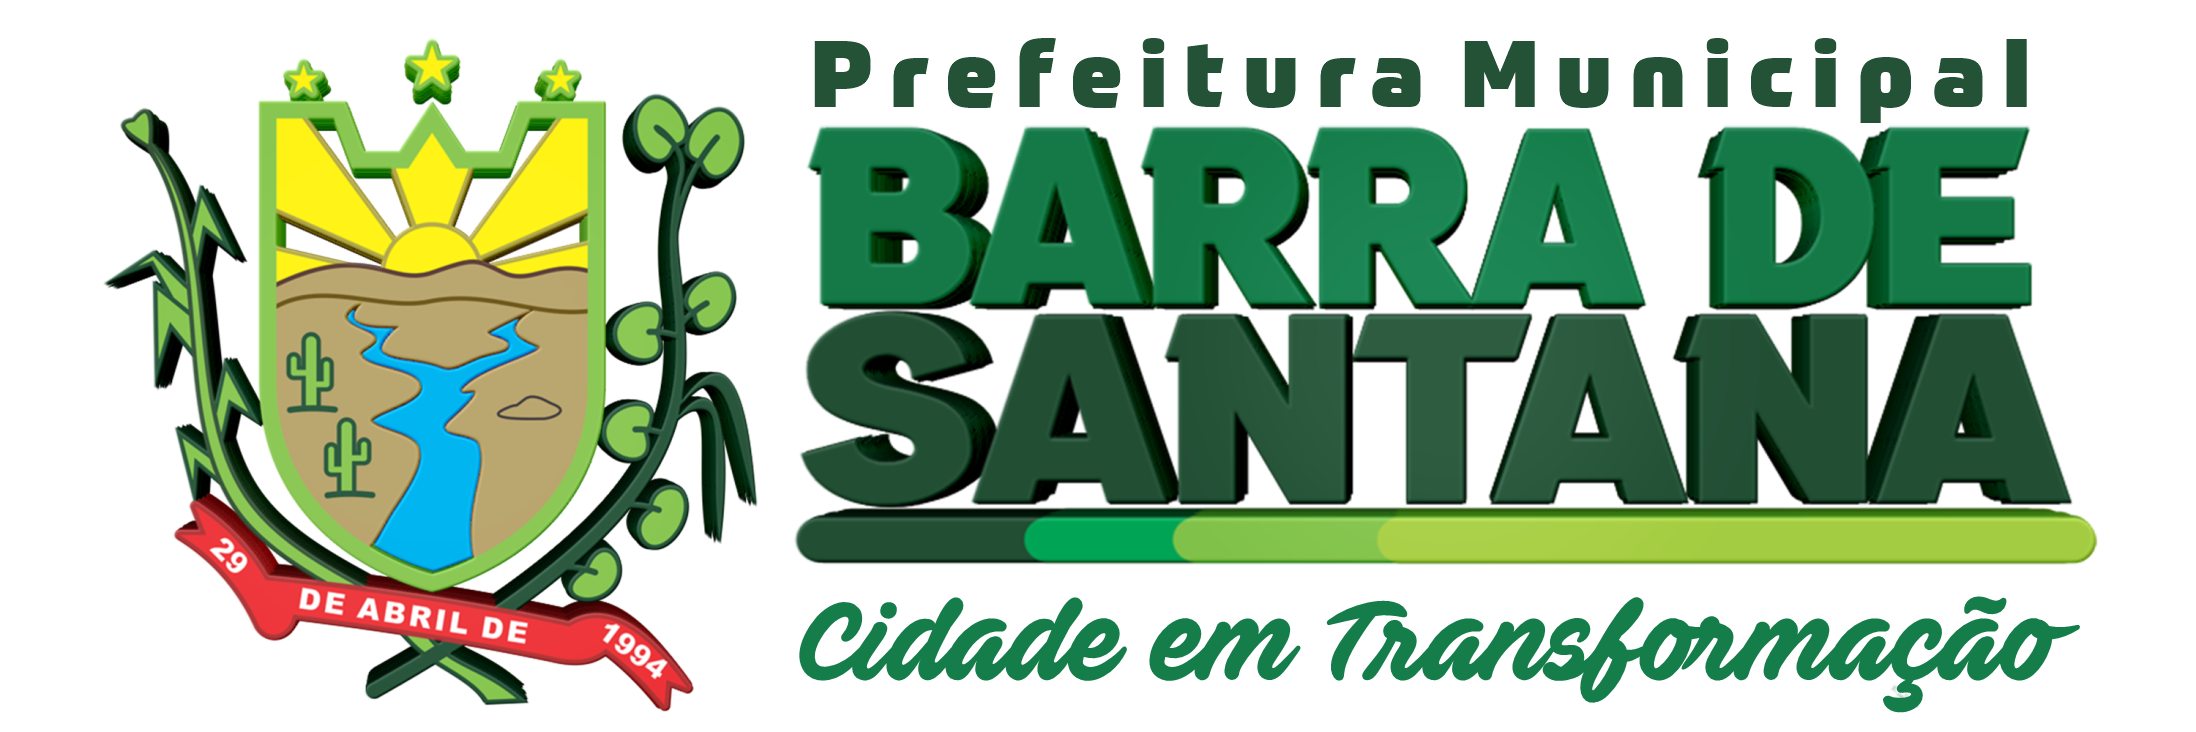 Barra de Santana- Prefeitura Municipal